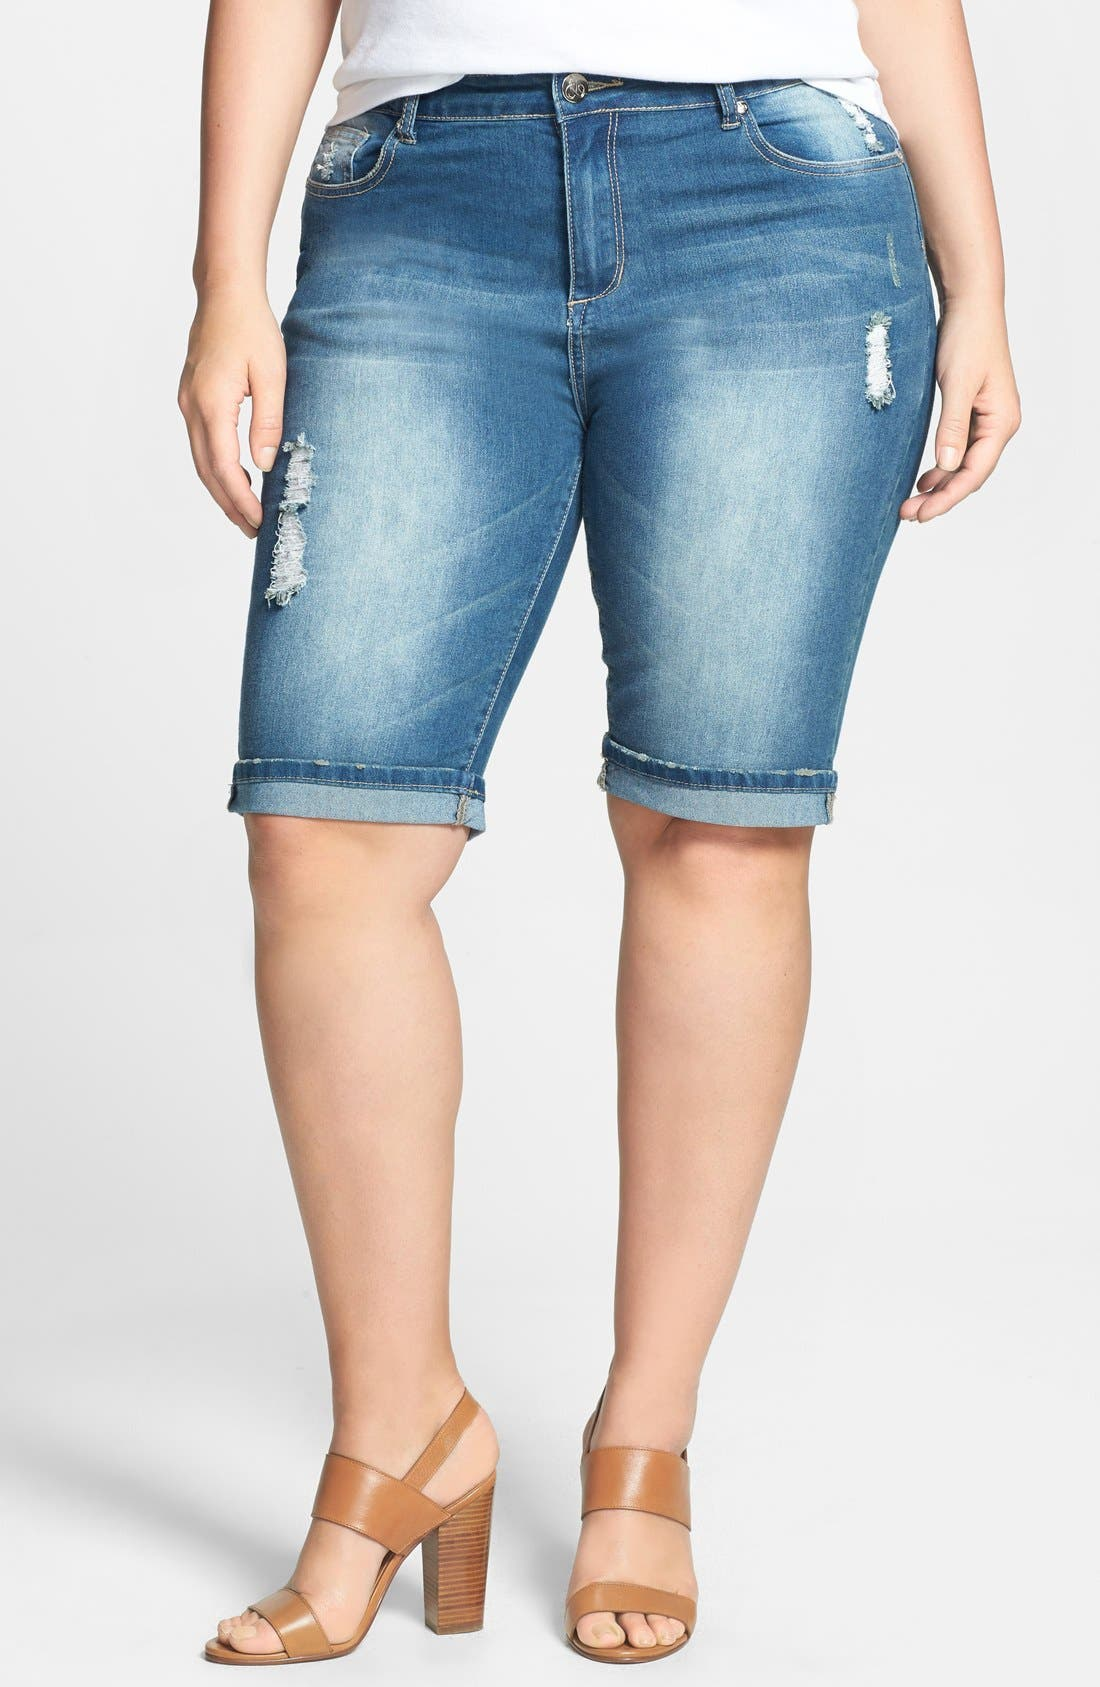 Alternate Image 1 Selected - City Chic Roll Cuff Distressed Denim Bermuda Shorts (Plus Size)